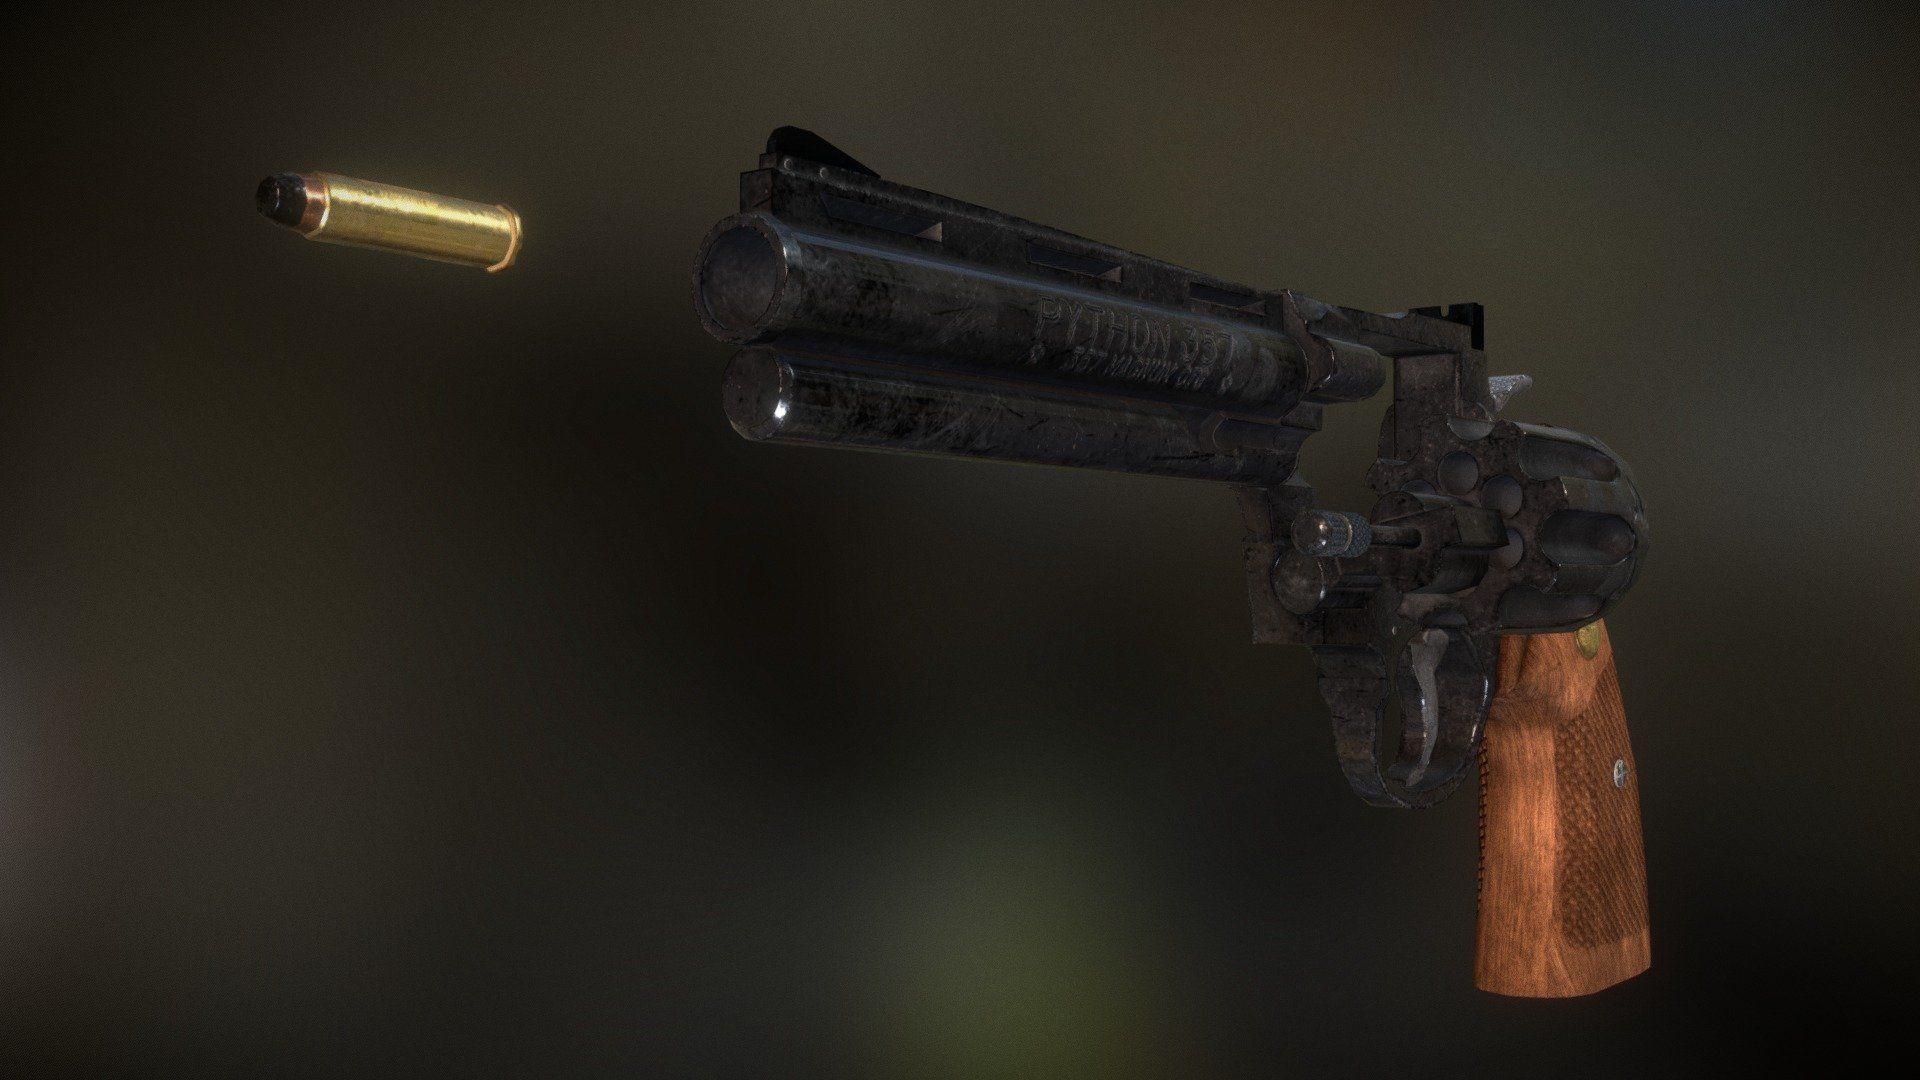 Magnum Colt Python 357 by paburoviii